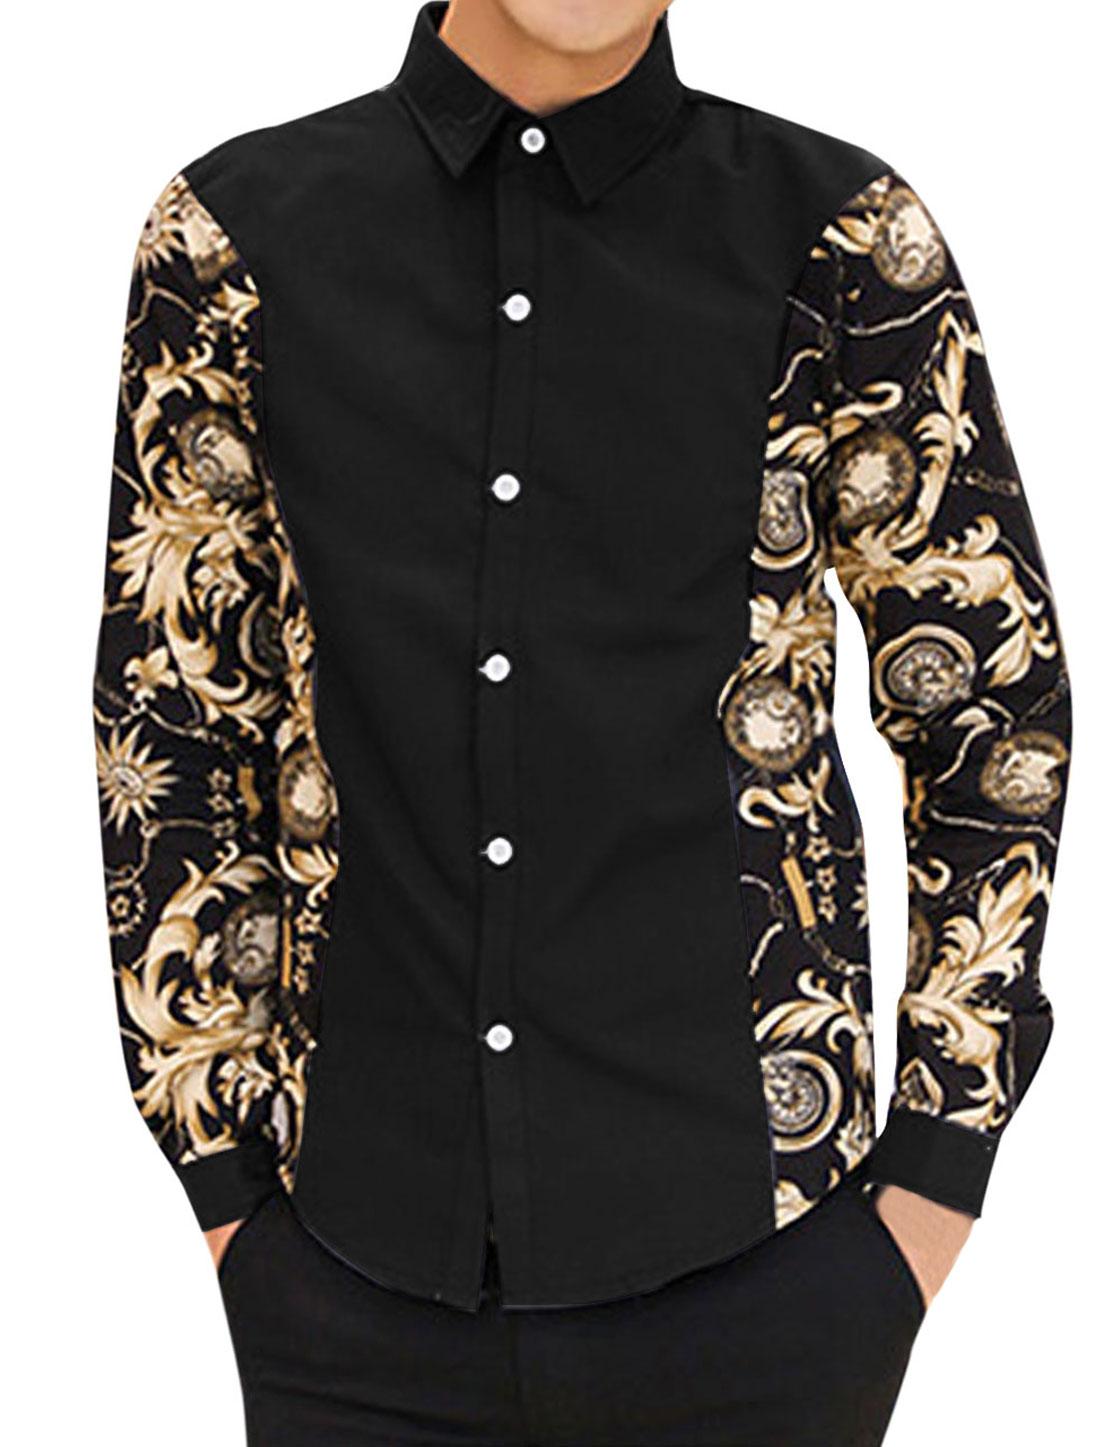 Men Contrast Floral Pocket Watch Print Contrast Sleeves Stylish Shirt Black M